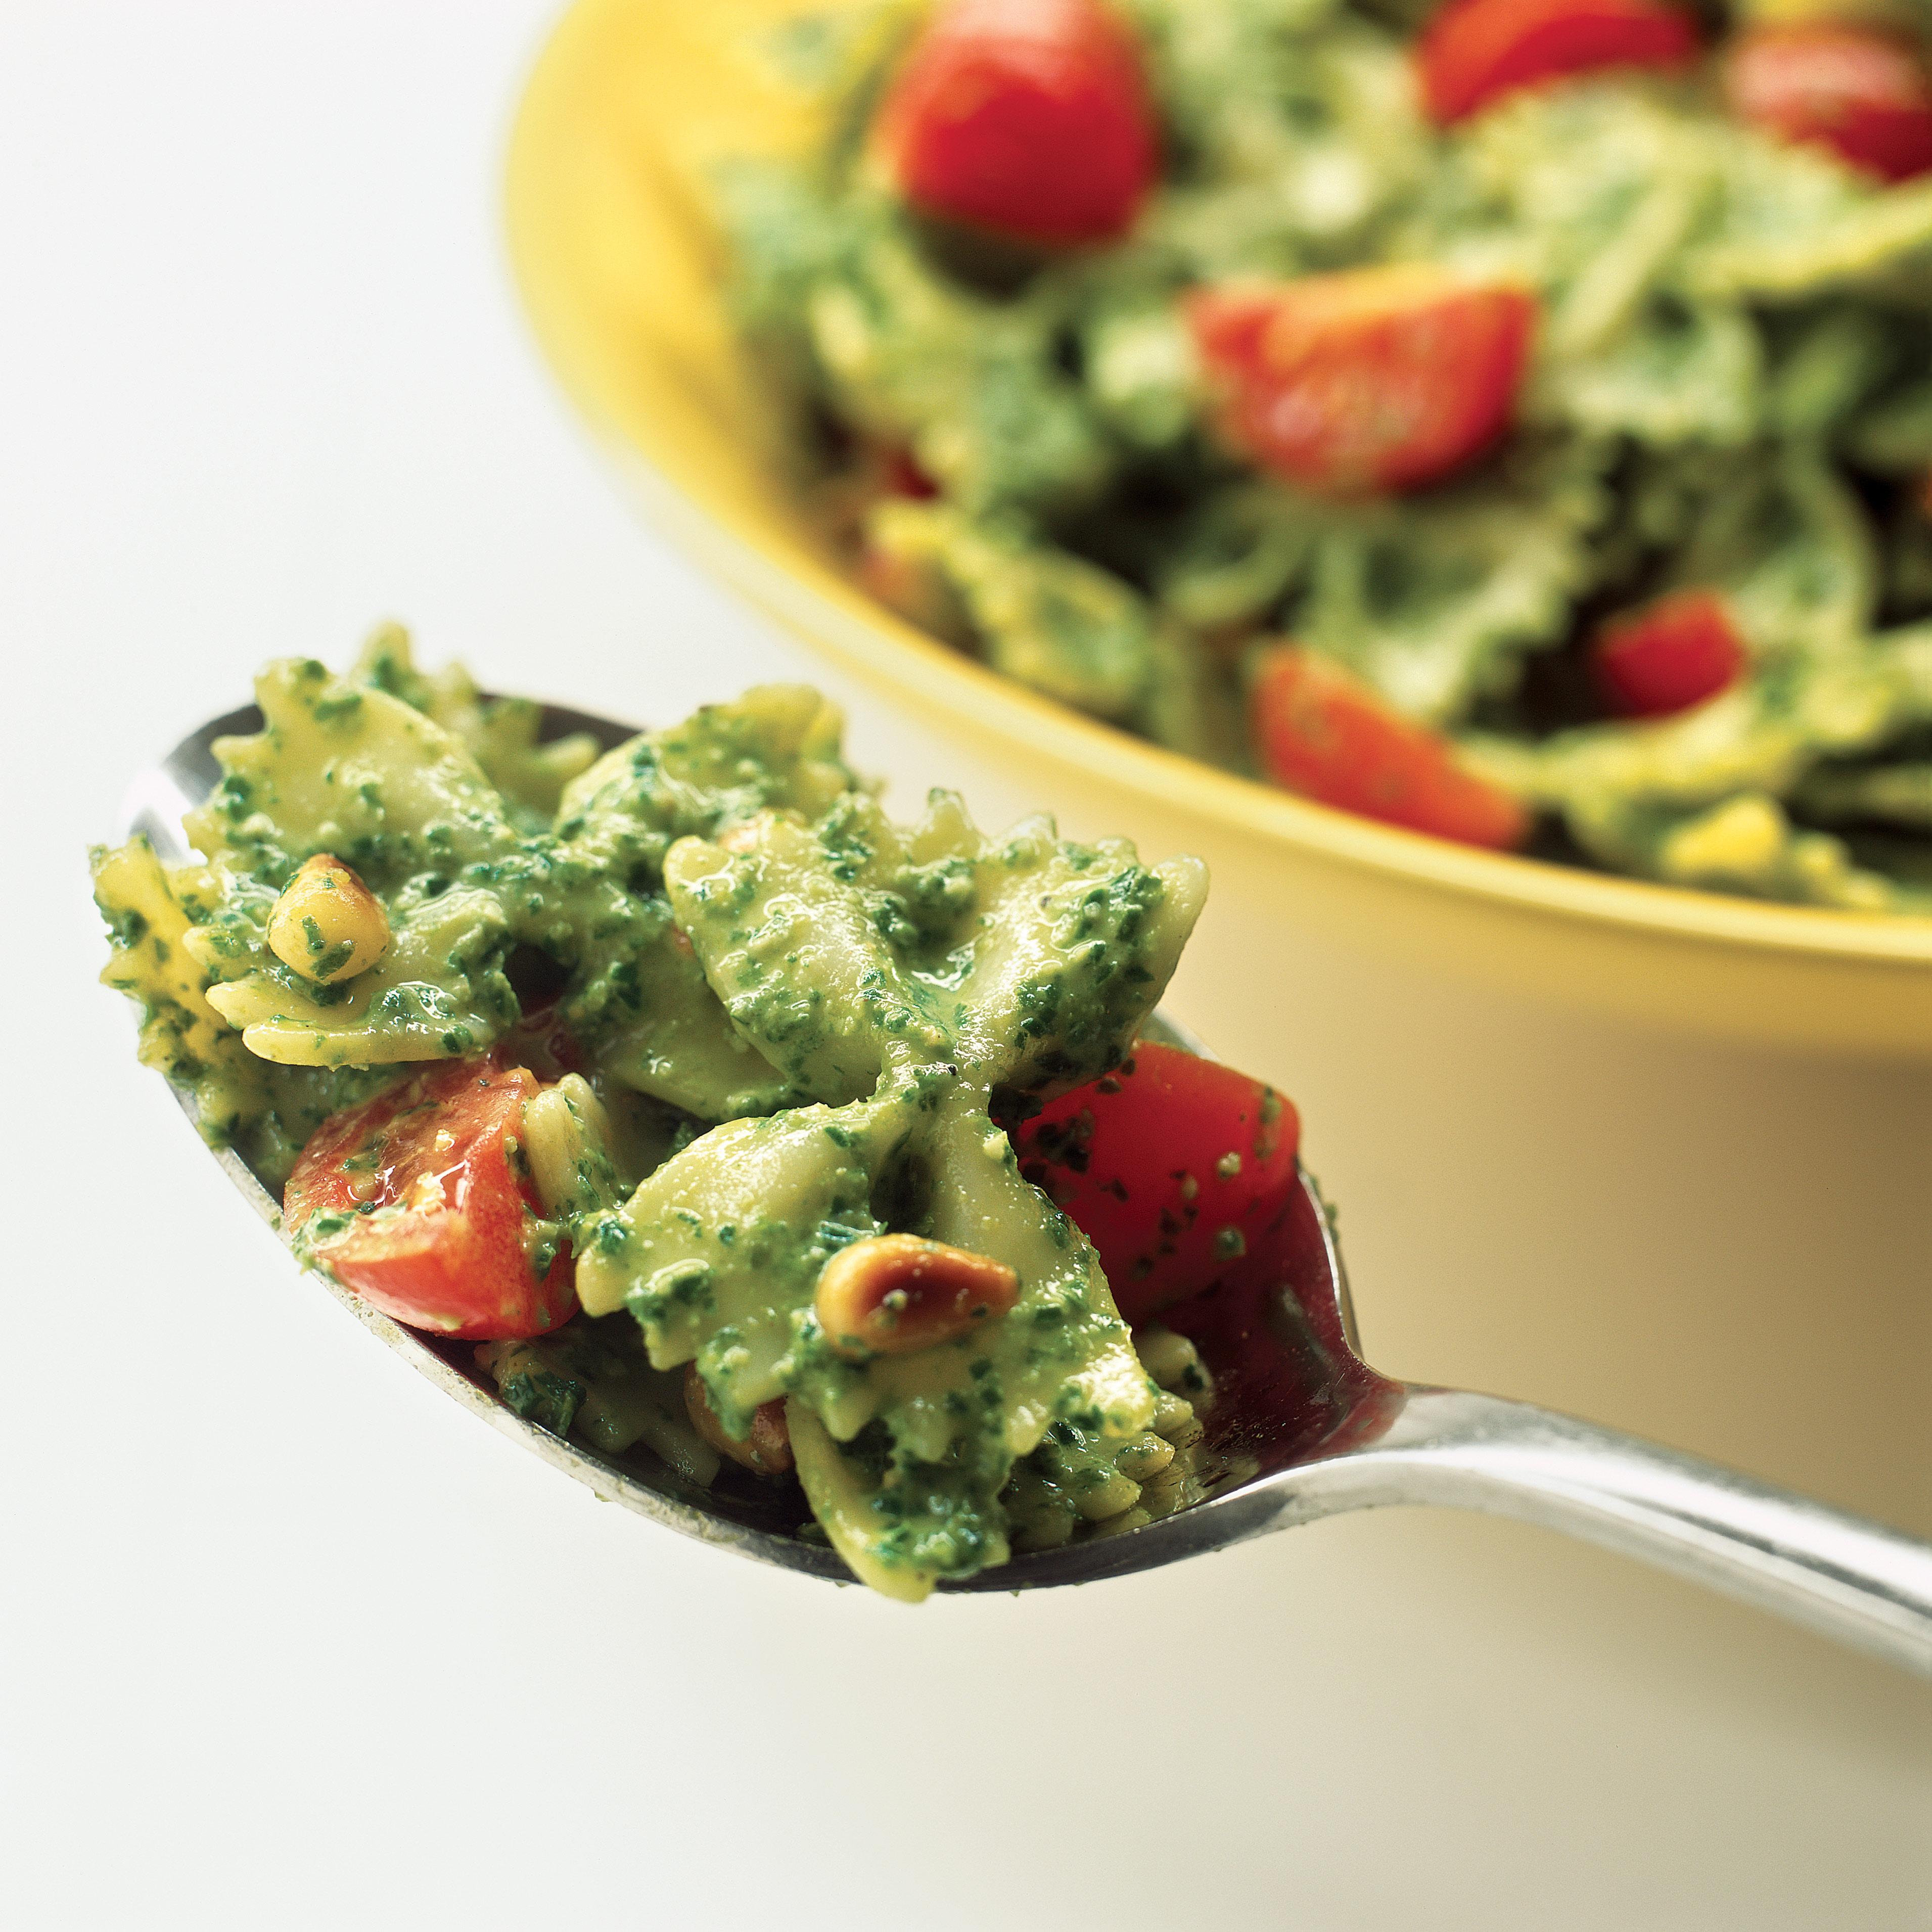 Pasta Salad with Pesto Recipe - America's Test Kitchen